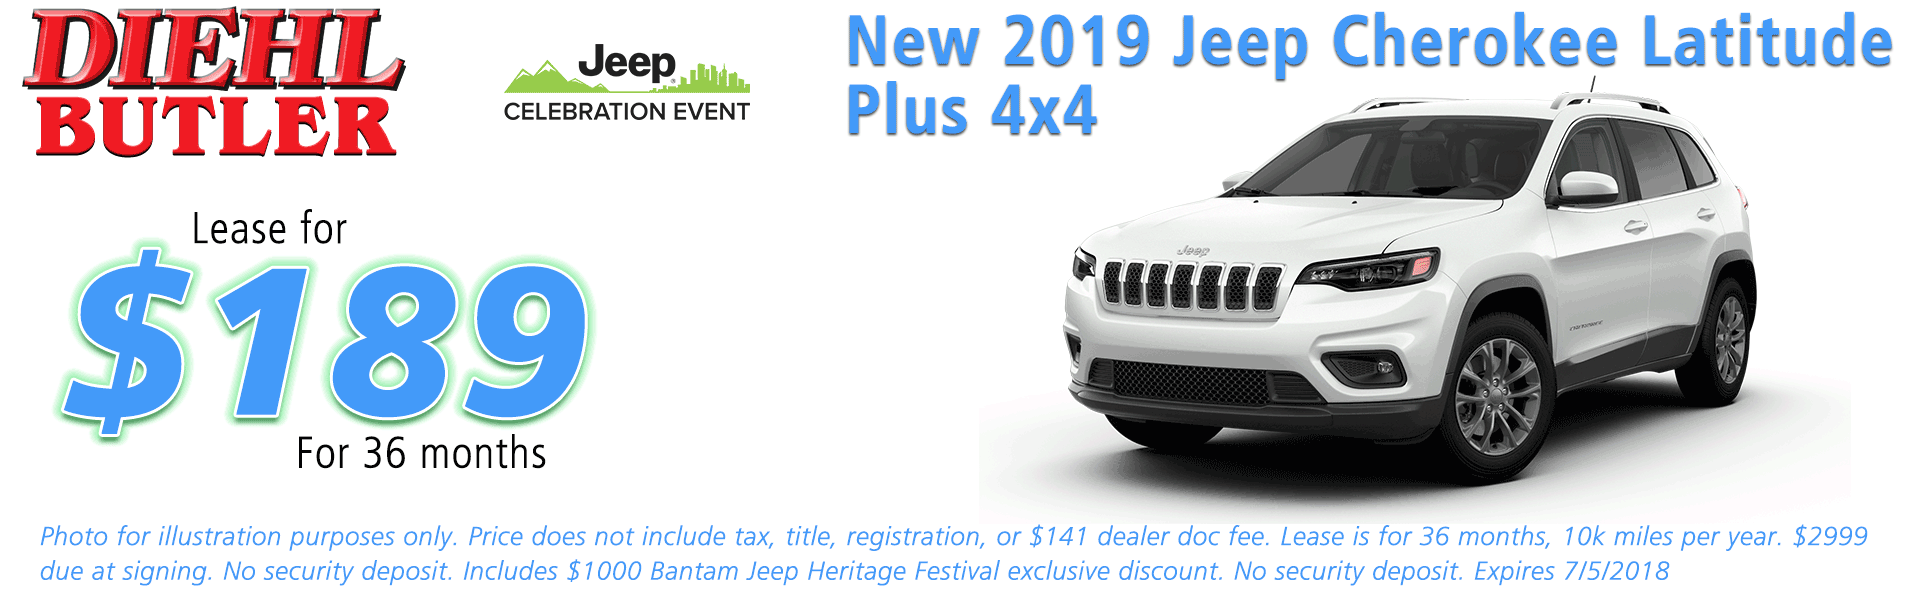 NEW 2019 JEEP CHEROKEE LATITUDE PLUS 4X4 Diehl of Butler, Pennsylvania. Chrysler Jeep Dodge Ram Toyota Volkswagen dealership